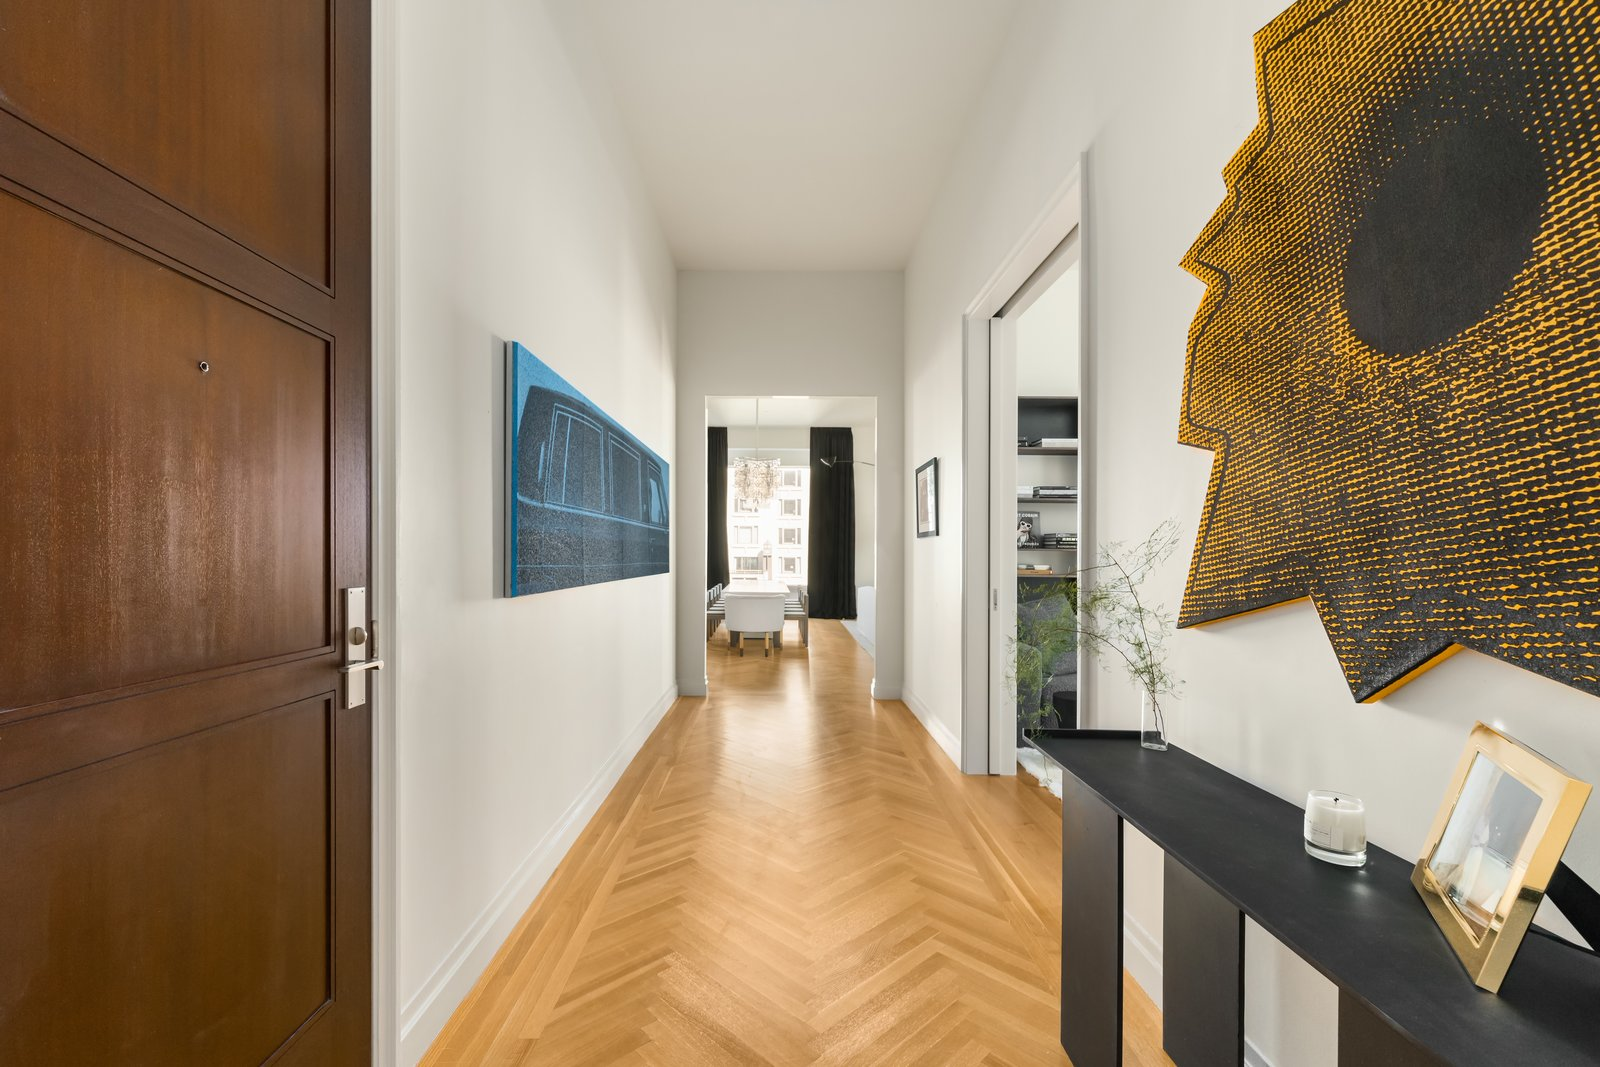 J.Lo and A-Rod's 432 Park Avenue apartment hallway with herringbone flooring